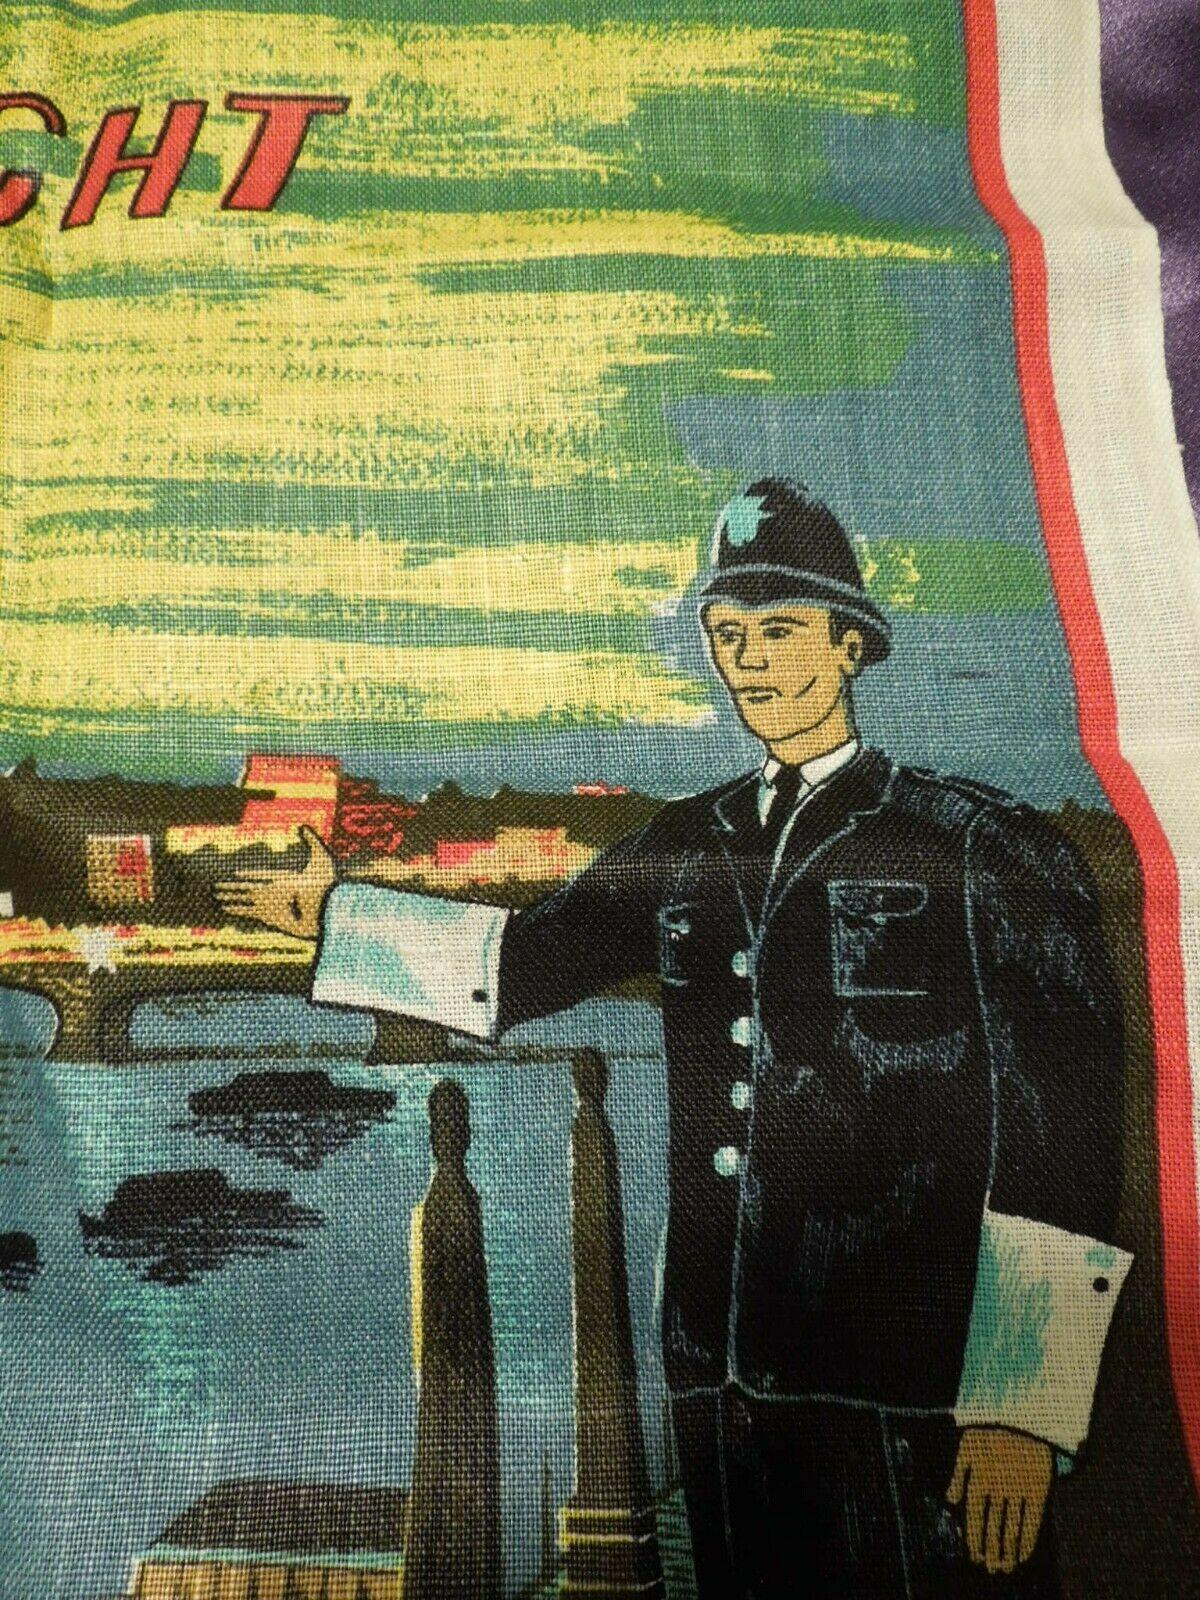 Vintage London by Night by Blackstaff Pure Irish Linen Towel Art image 10